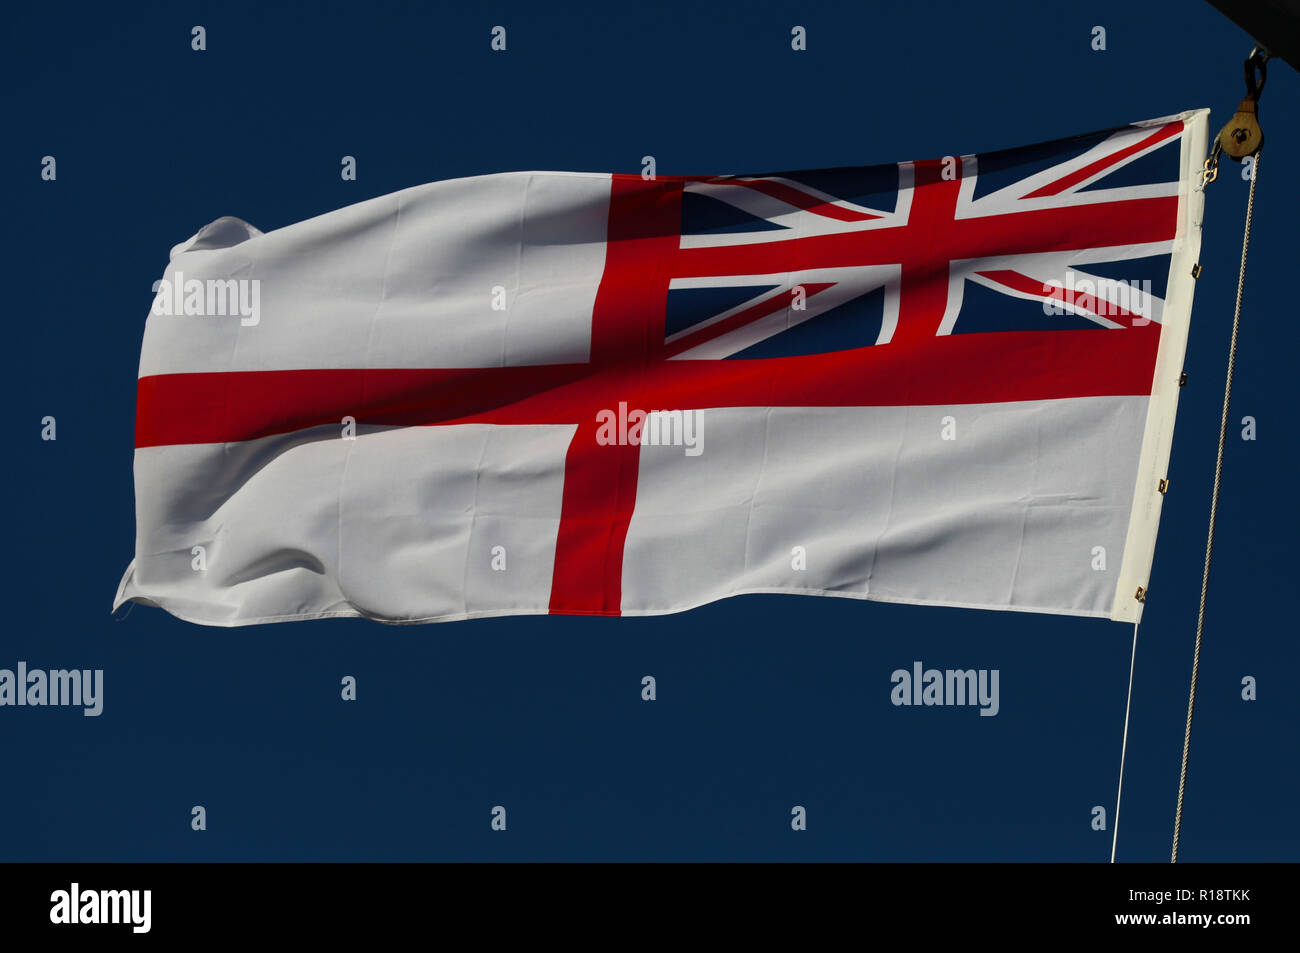 Red Ensign Merchant Navy Desk Top Flag Football England british History Ships bn